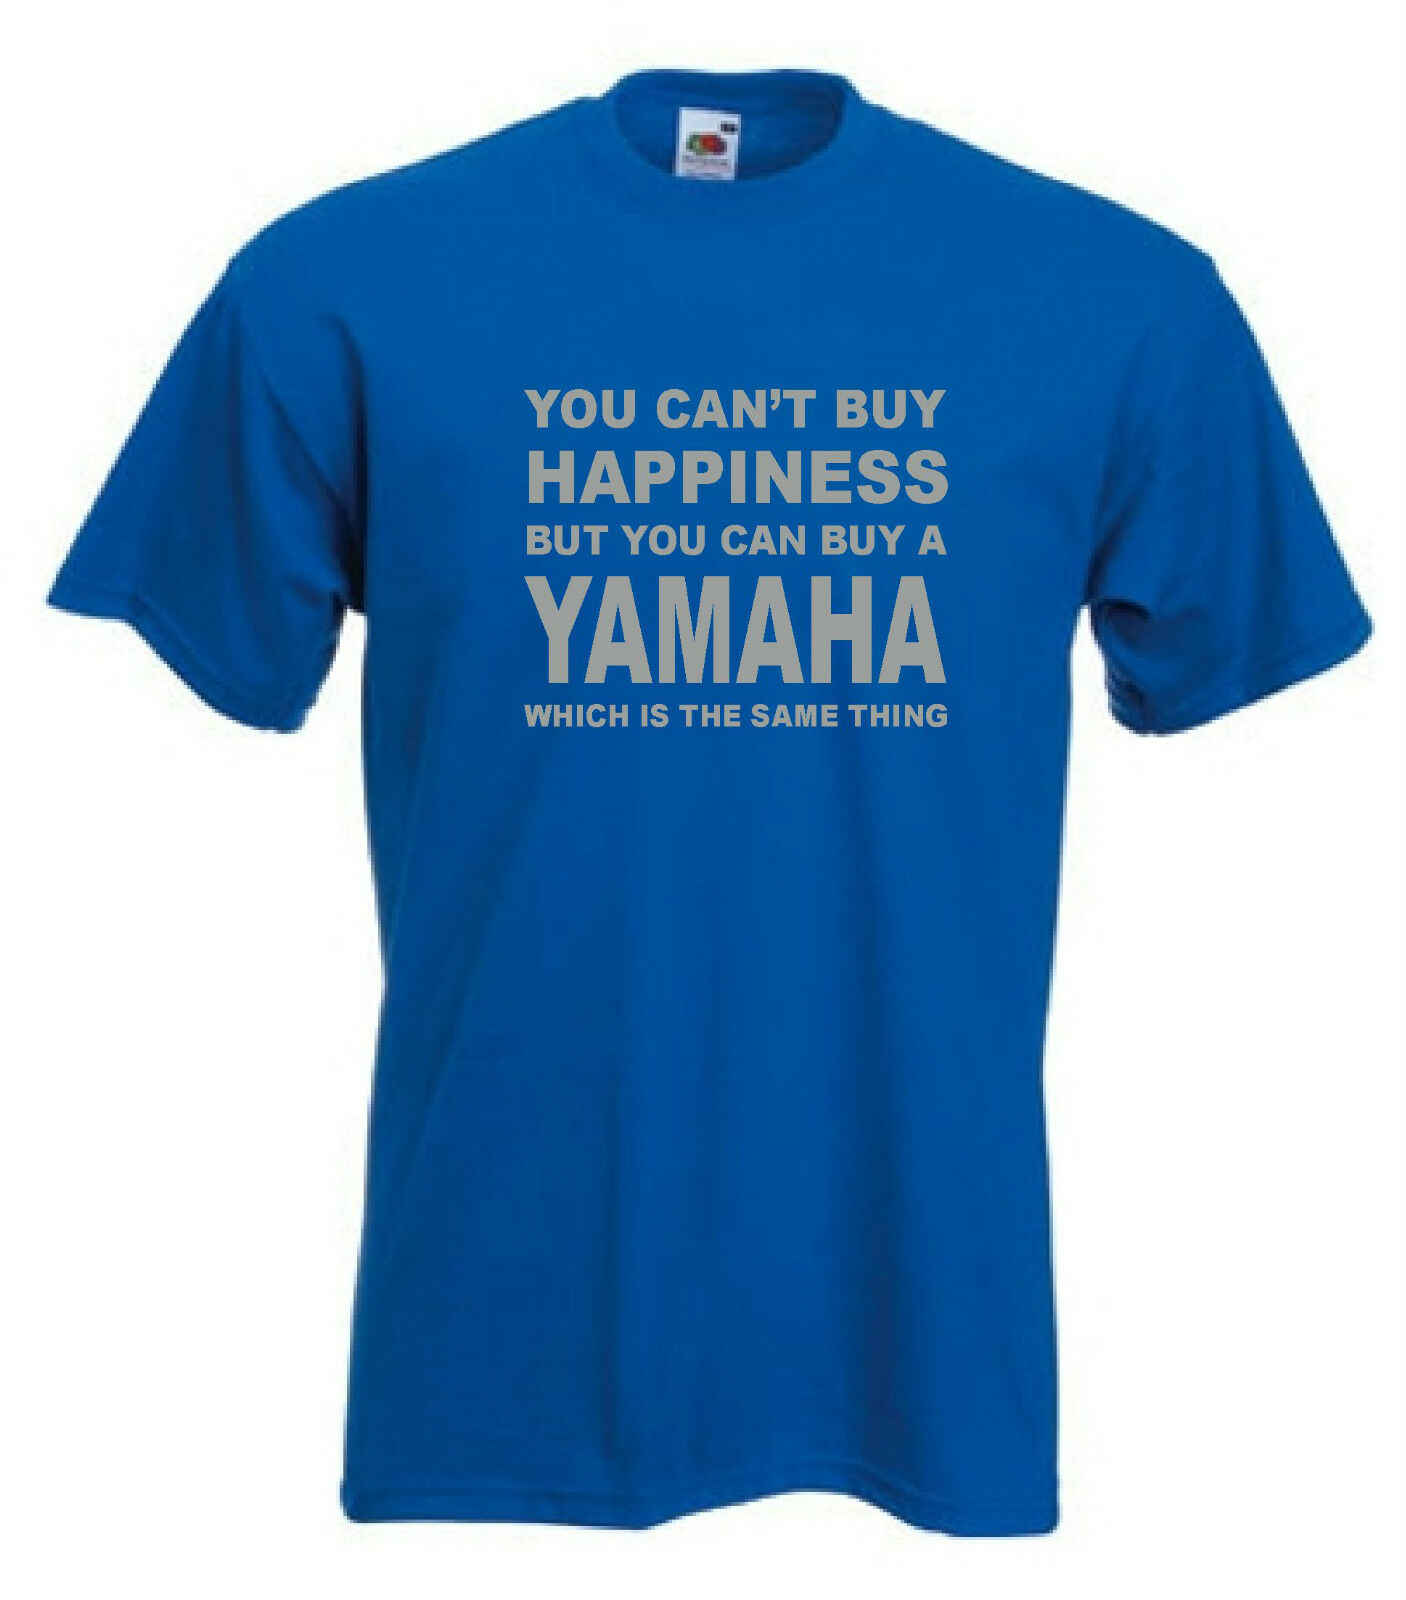 New Yamaha Motorcycle Racing Black T-shirt Racing Size S-3XL